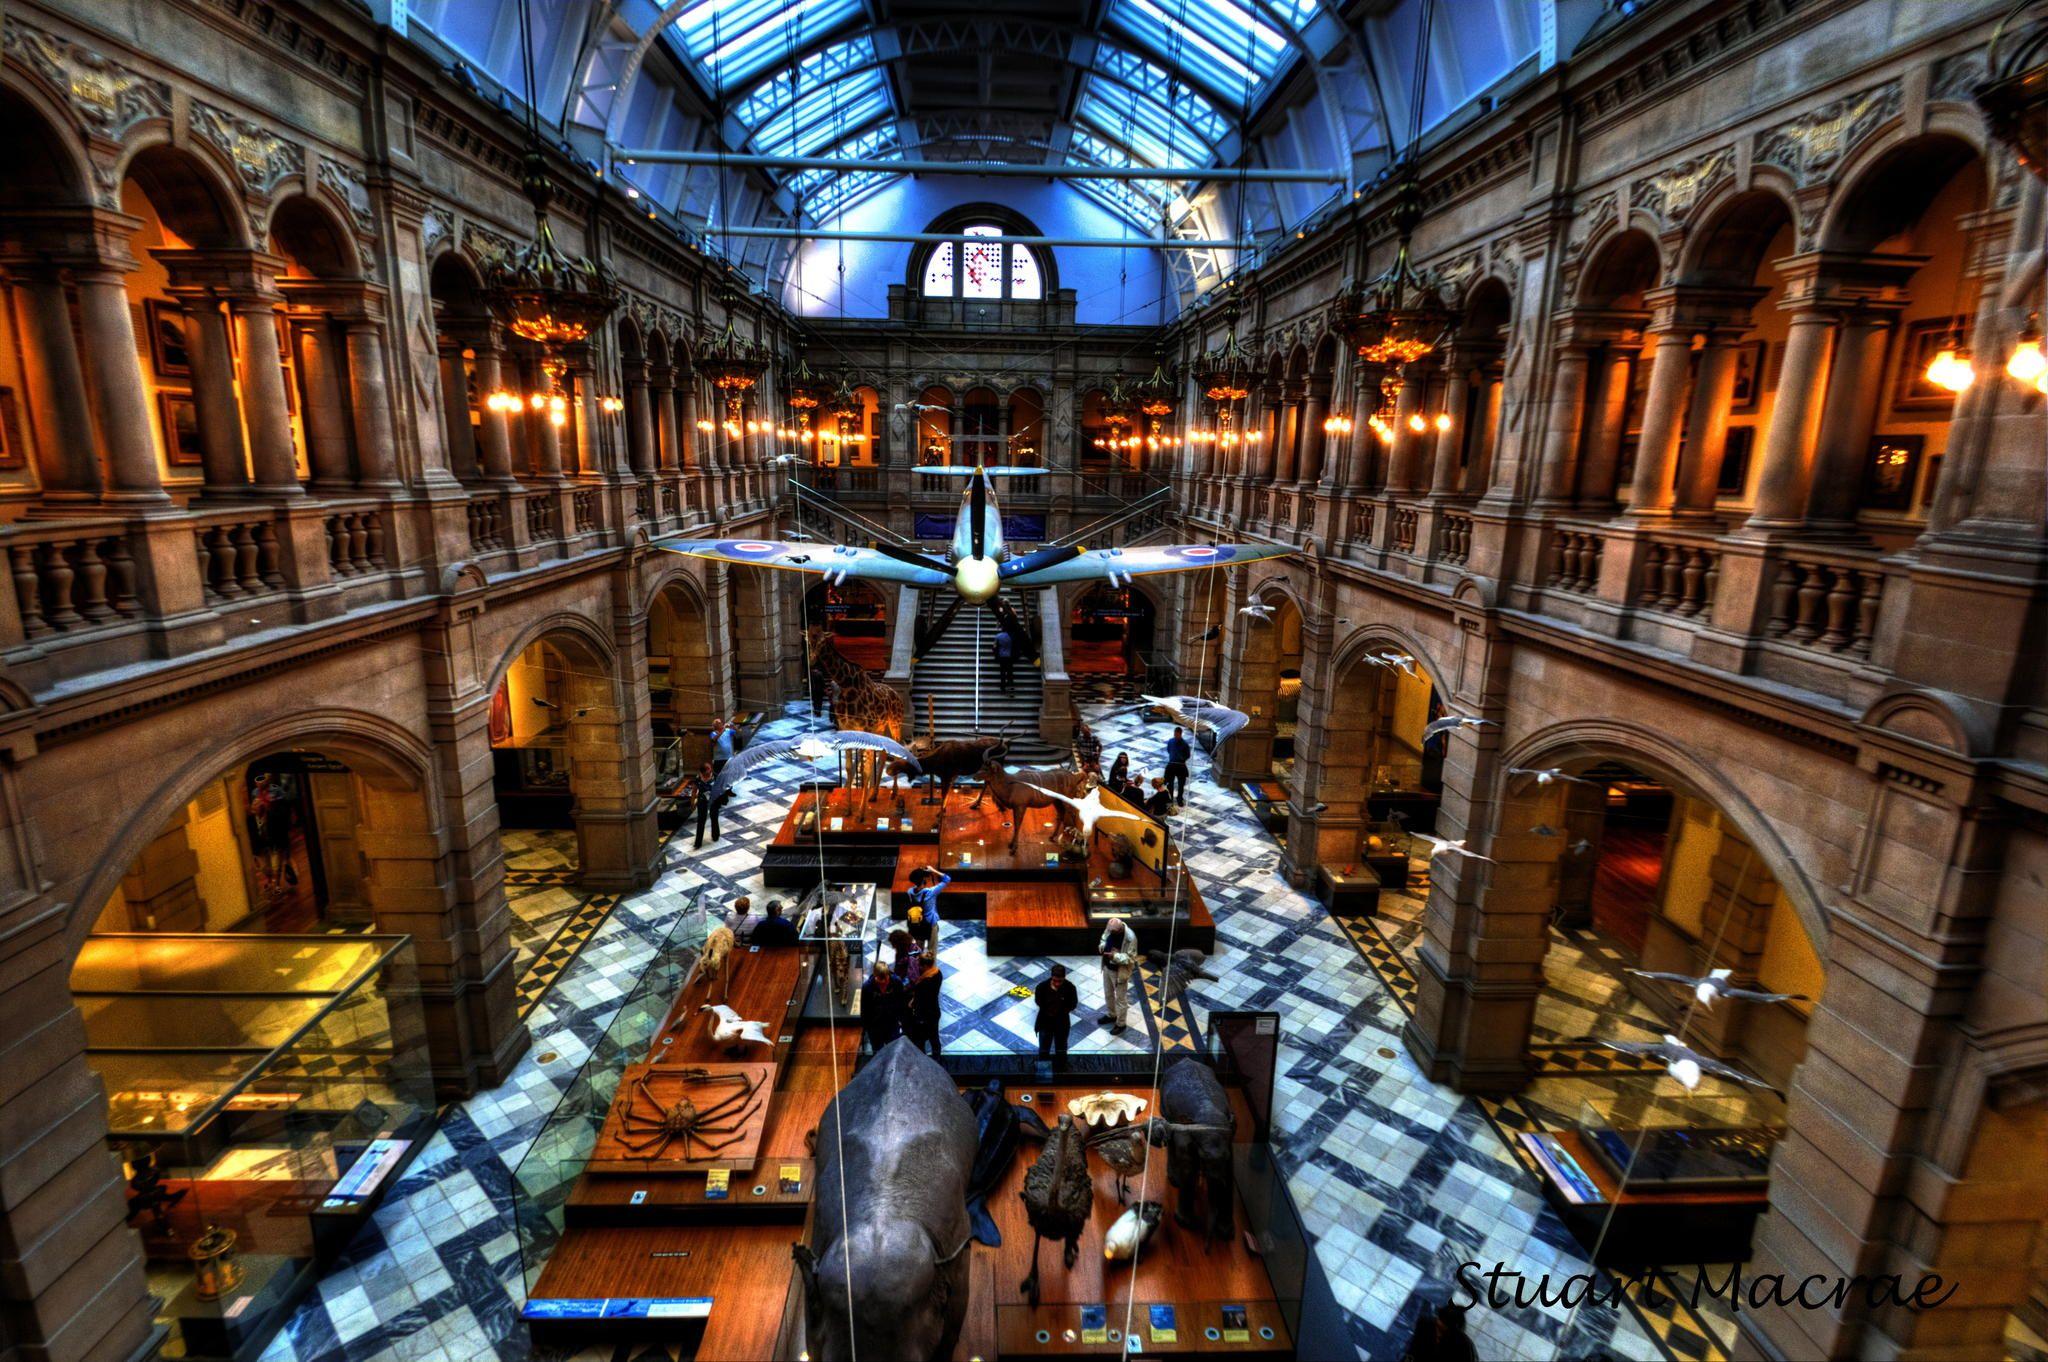 Glasgows Kelvingrove Museum and Art Gallery